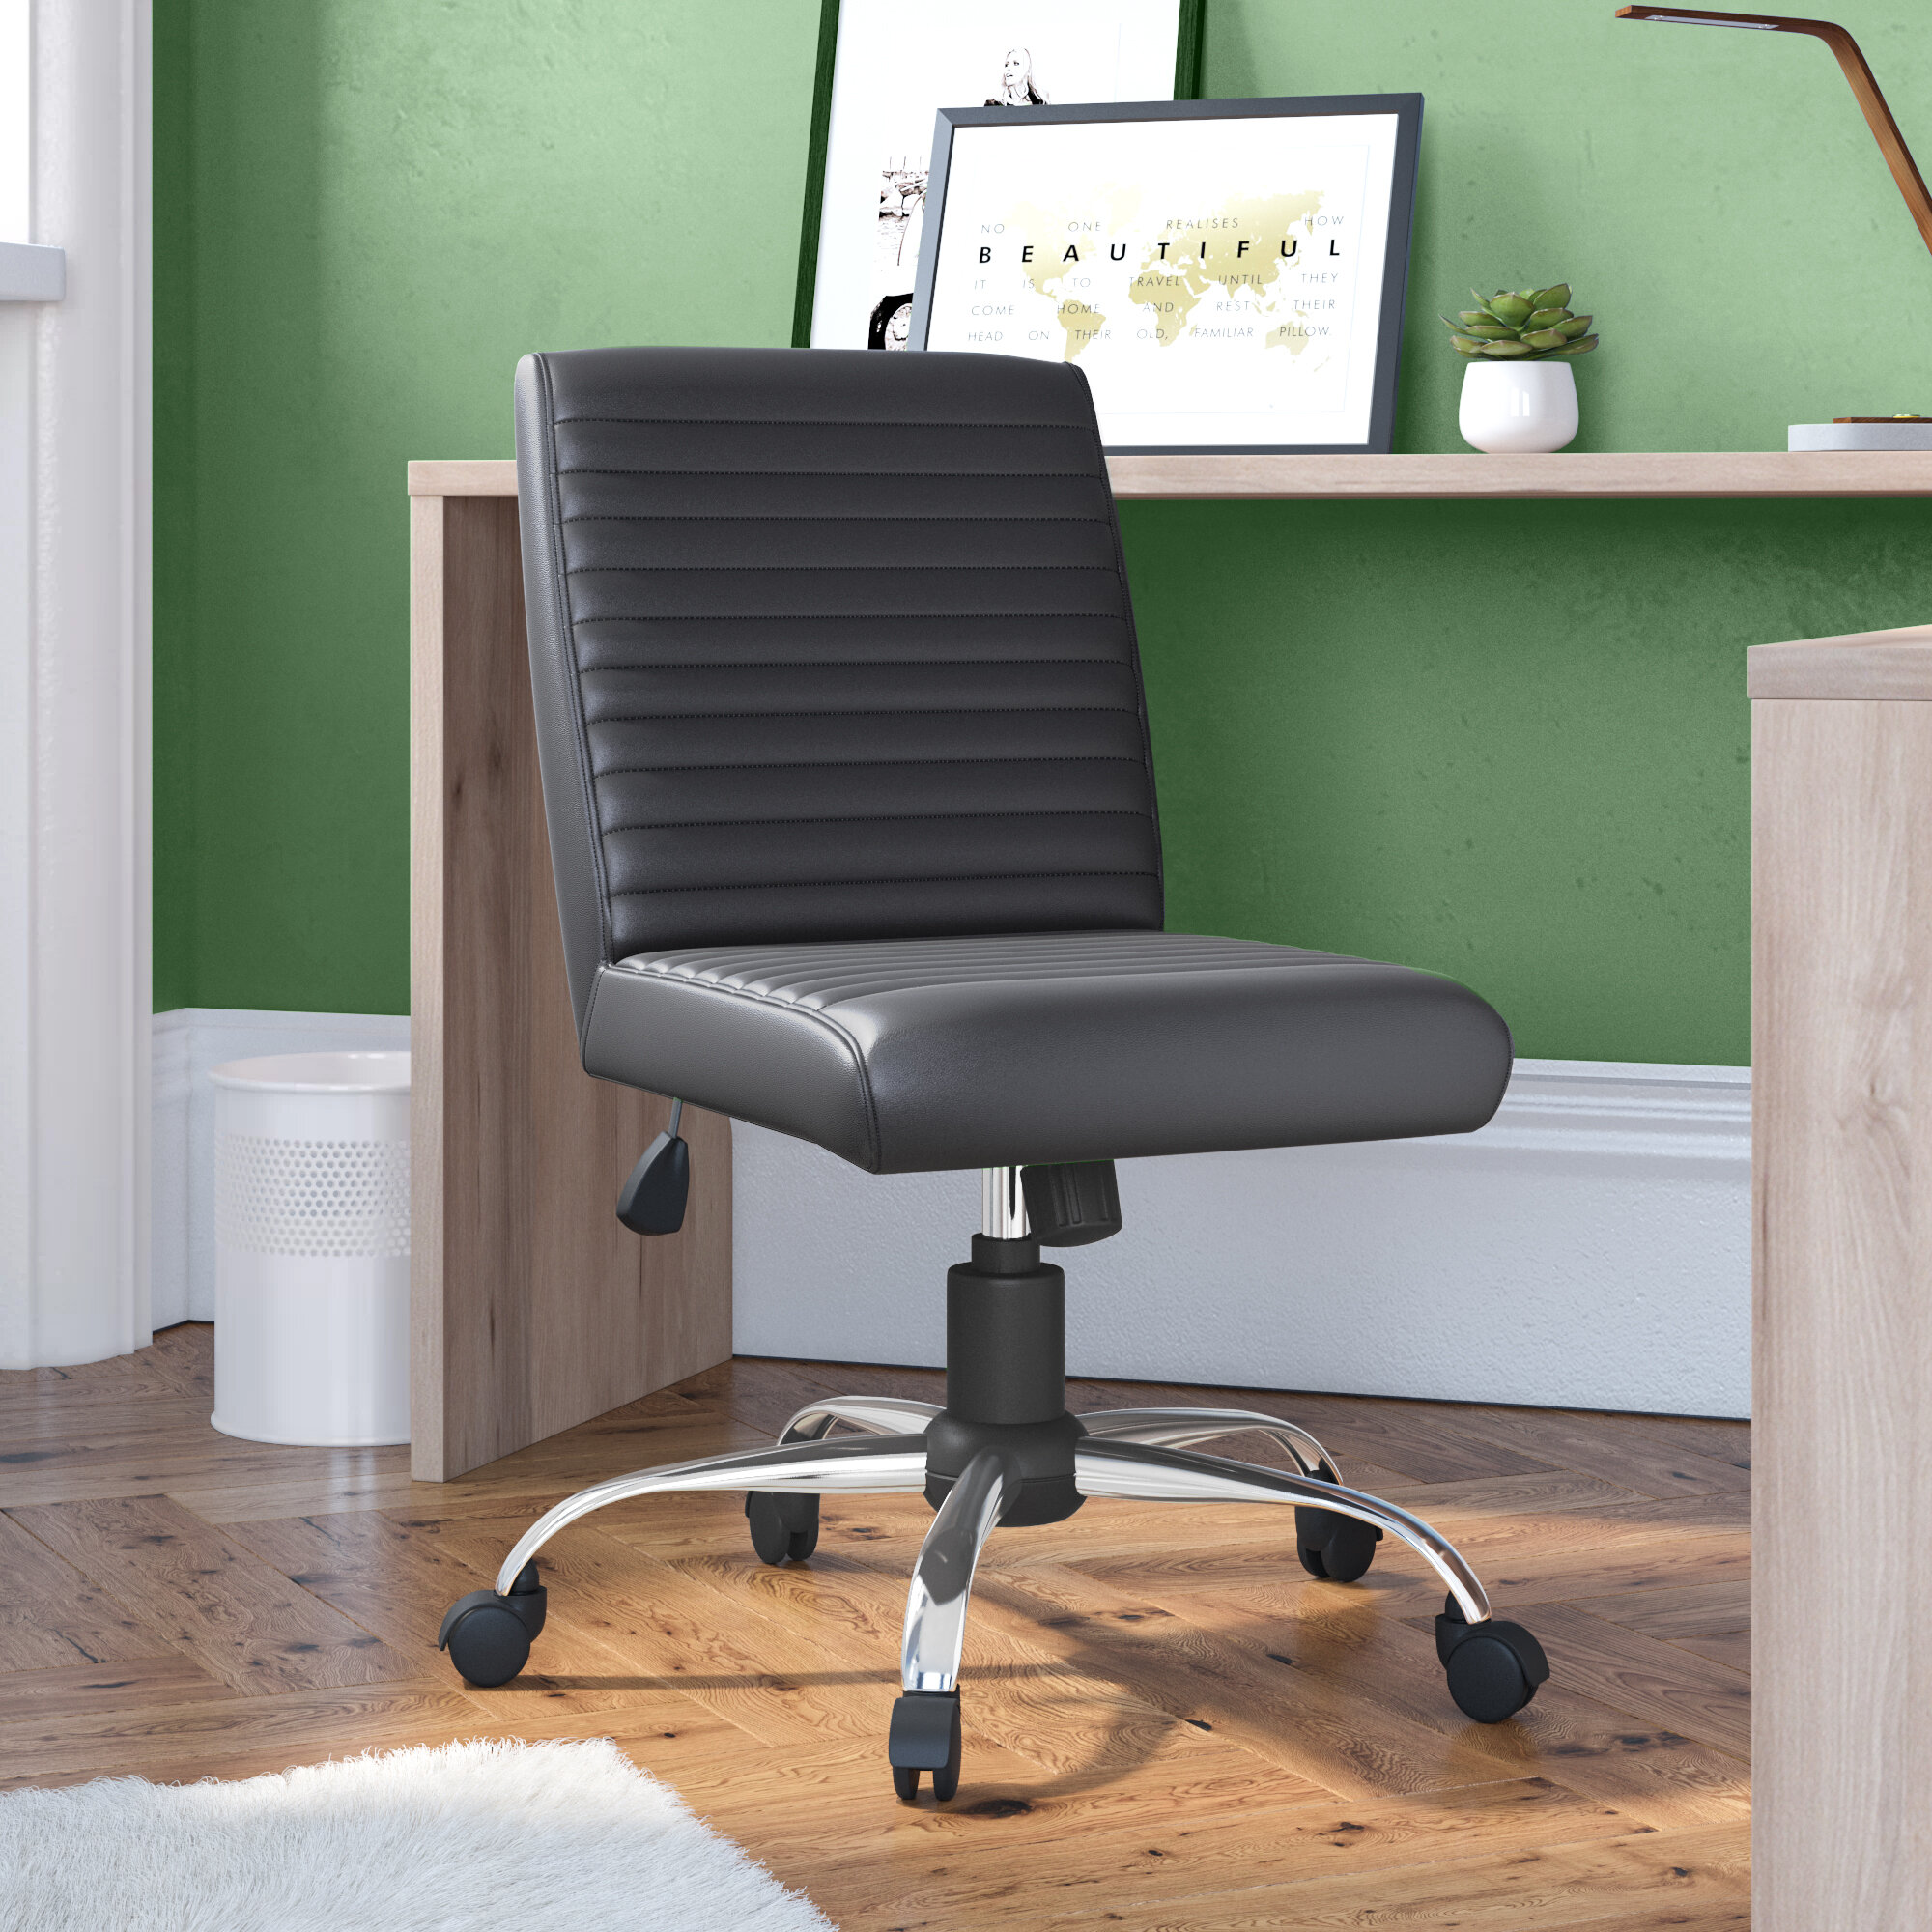 Metro Lane Mid Back Desk Chair